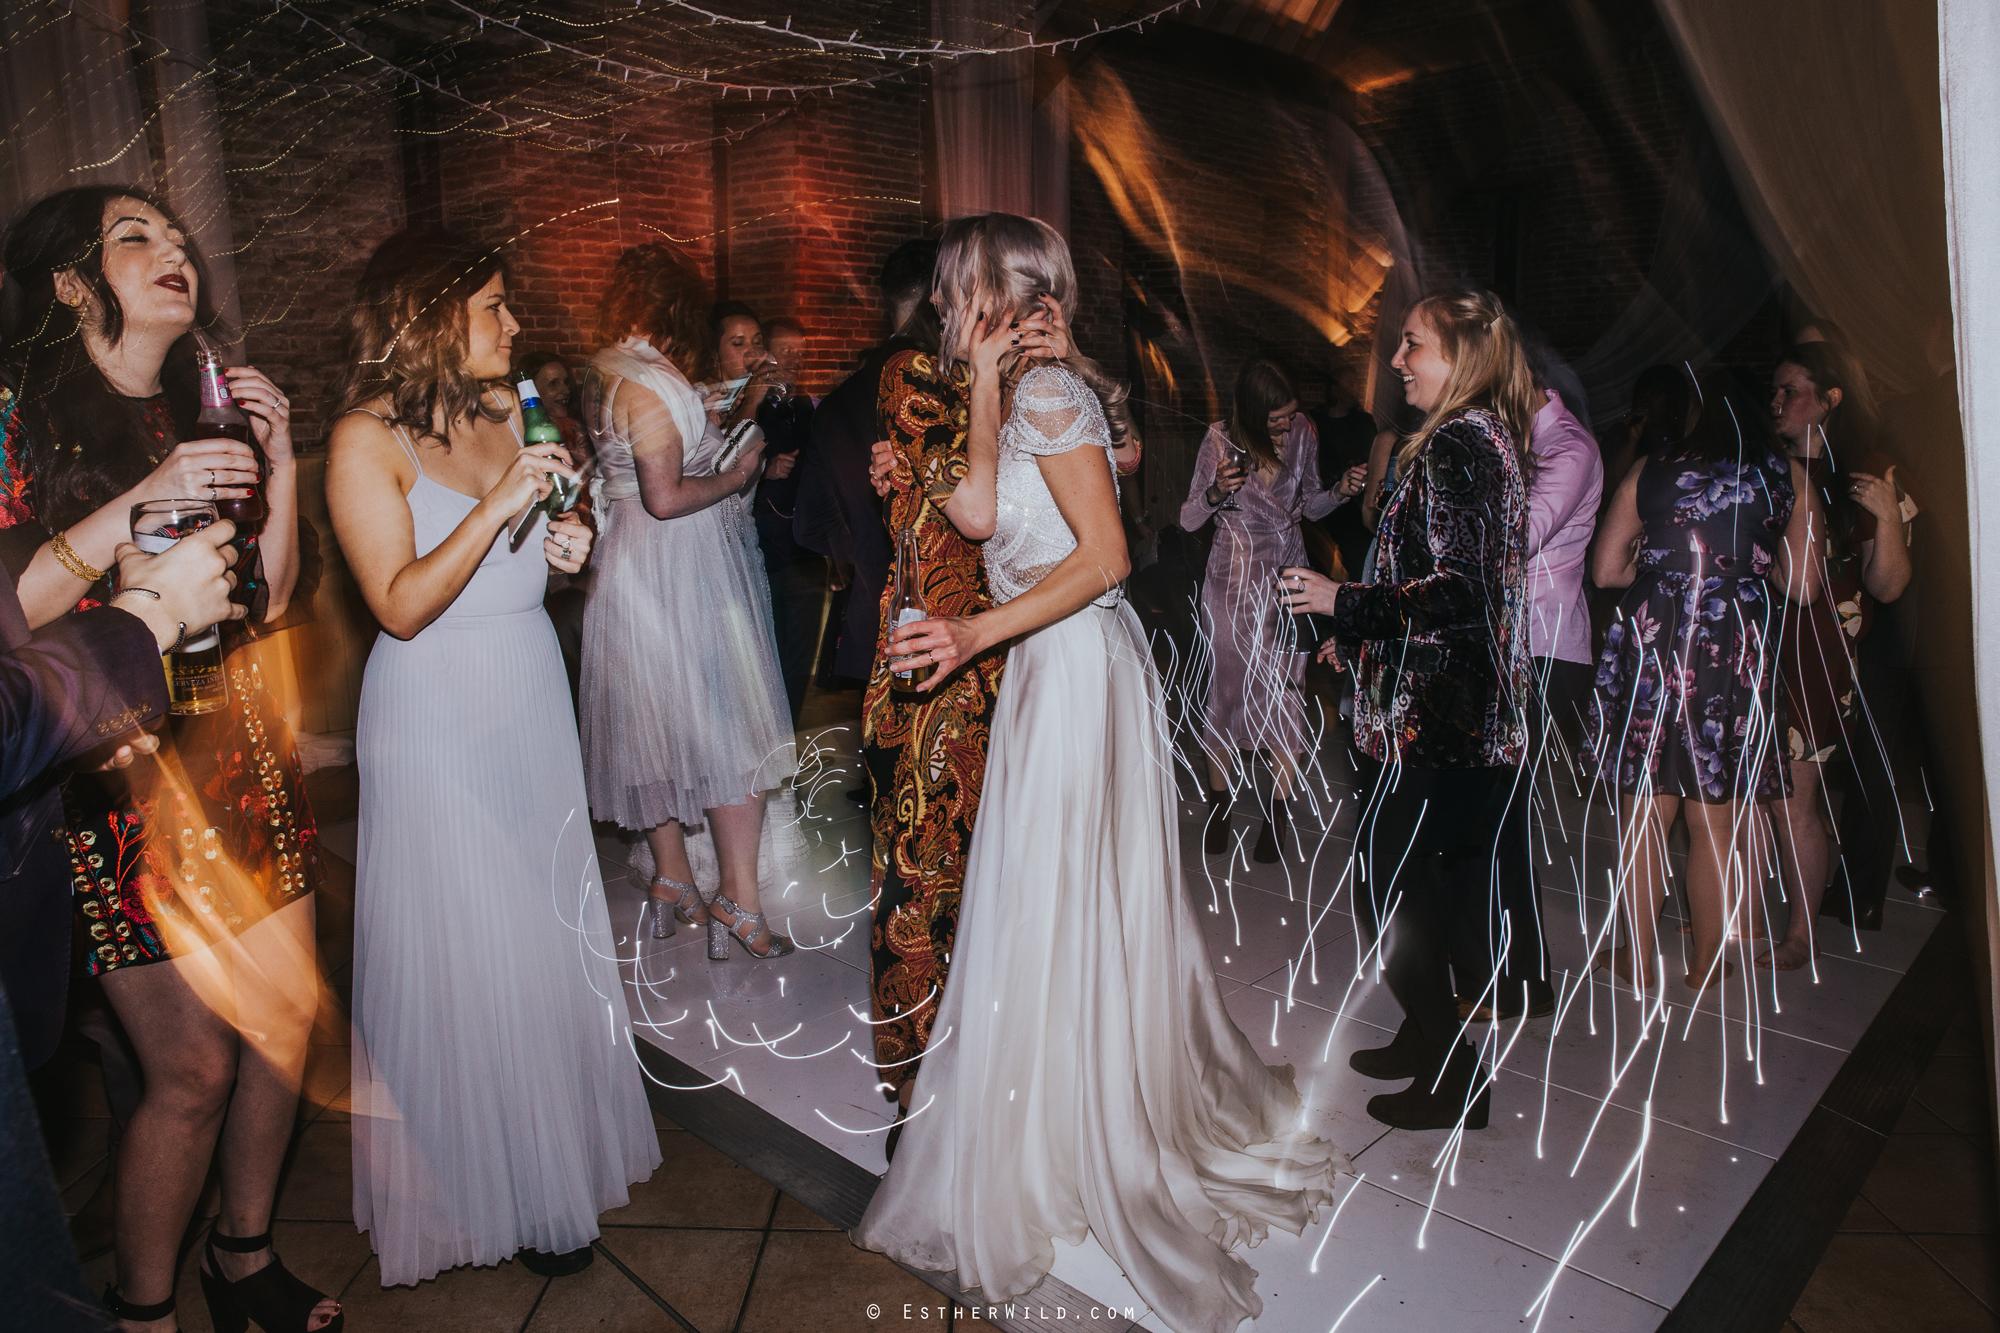 Elms_Barn_Weddings_Suffolk_Photographer_Copyright_Esther_Wild_IMG_3699.jpg